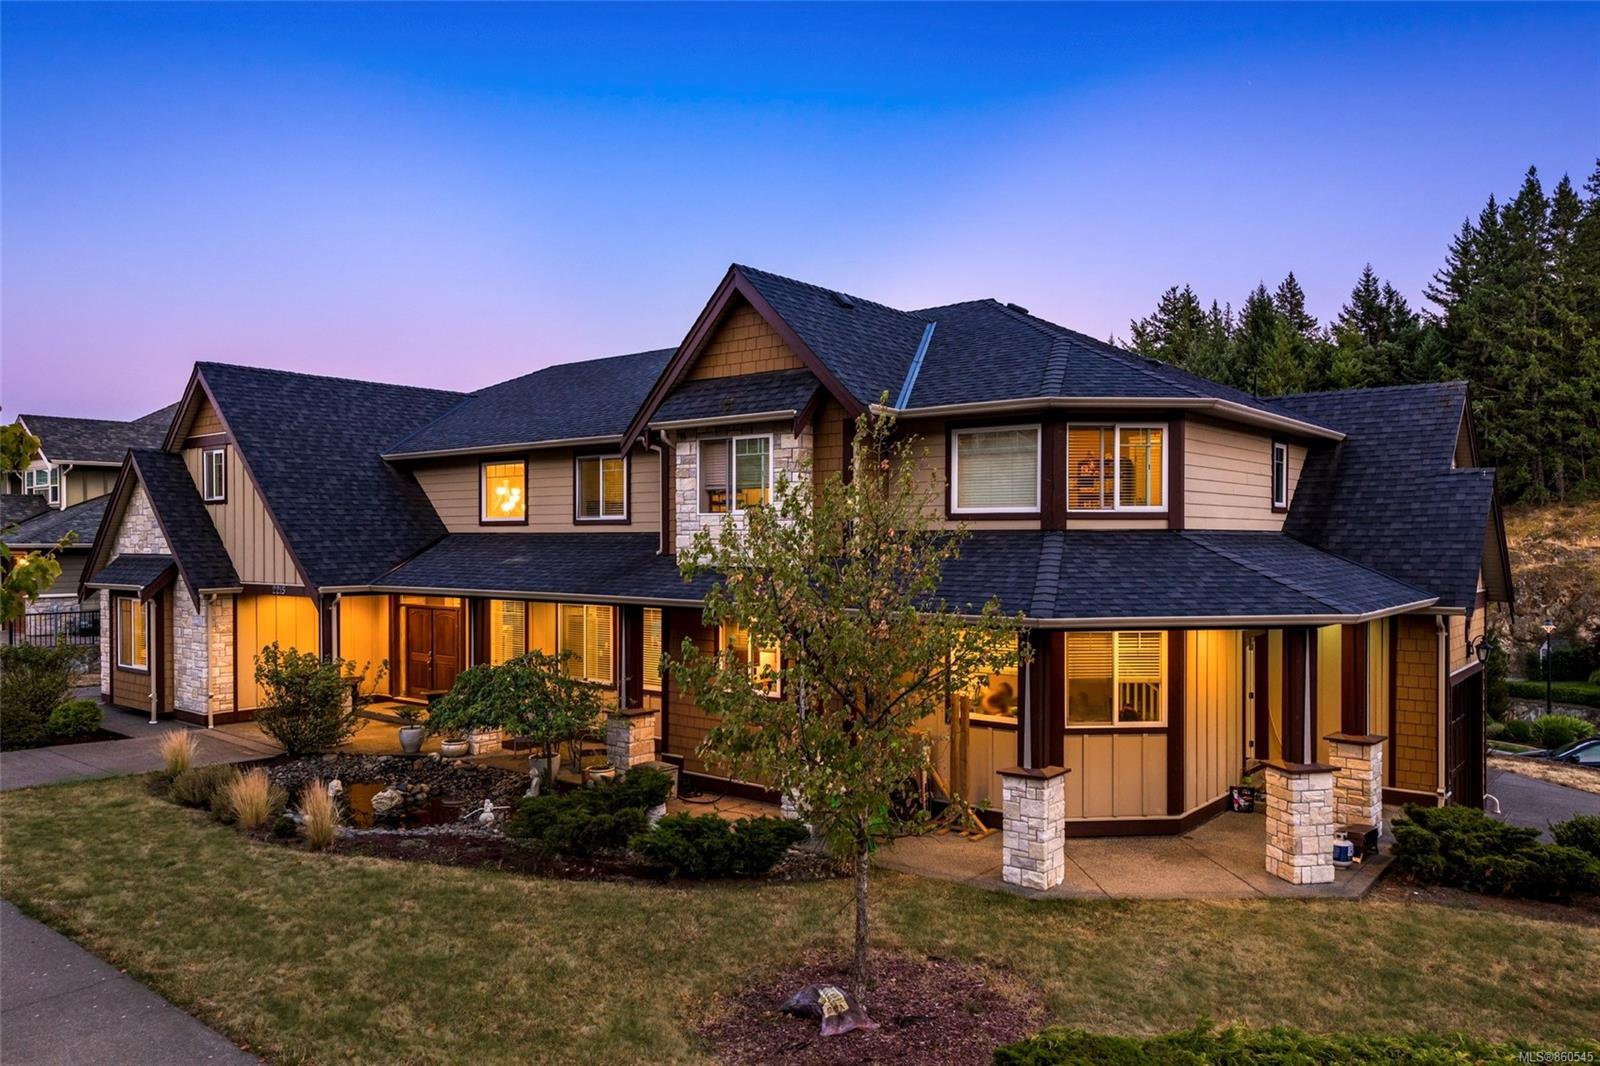 Main Photo: 2215 Spirit Ridge Dr in : La Bear Mountain House for sale (Langford)  : MLS®# 860545